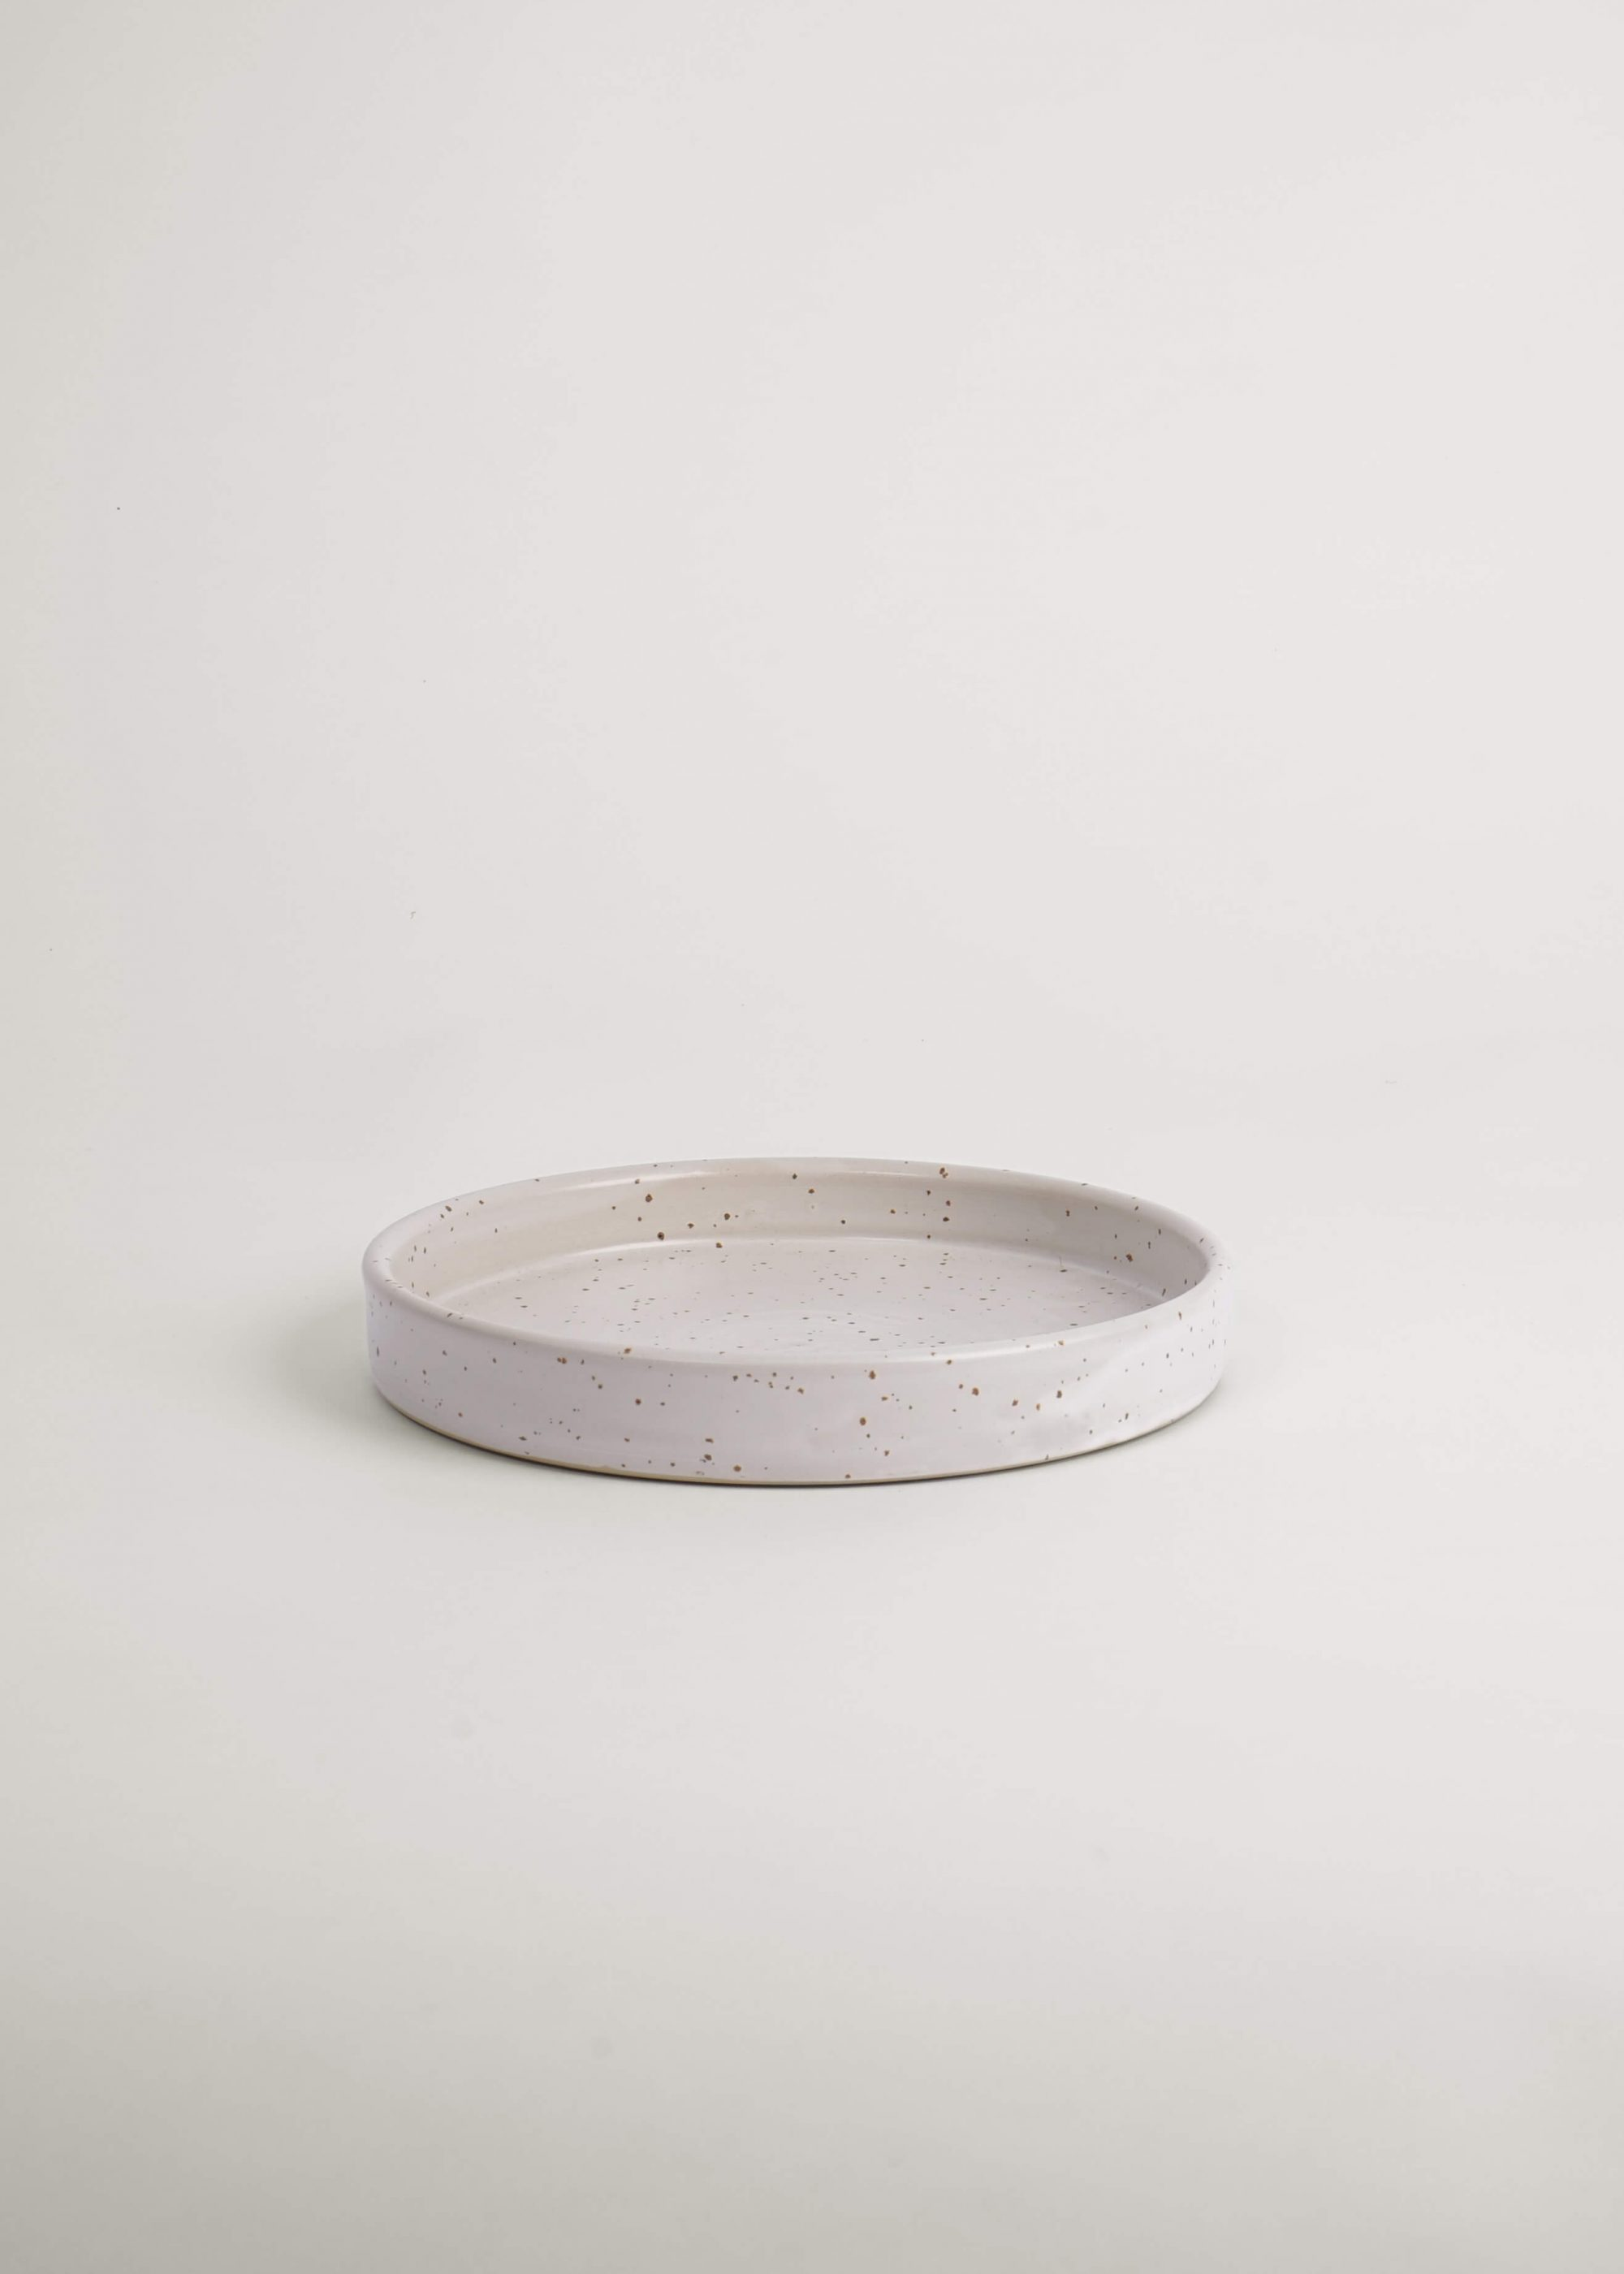 Product image for N° ICD12 Balzar Planter Plate S